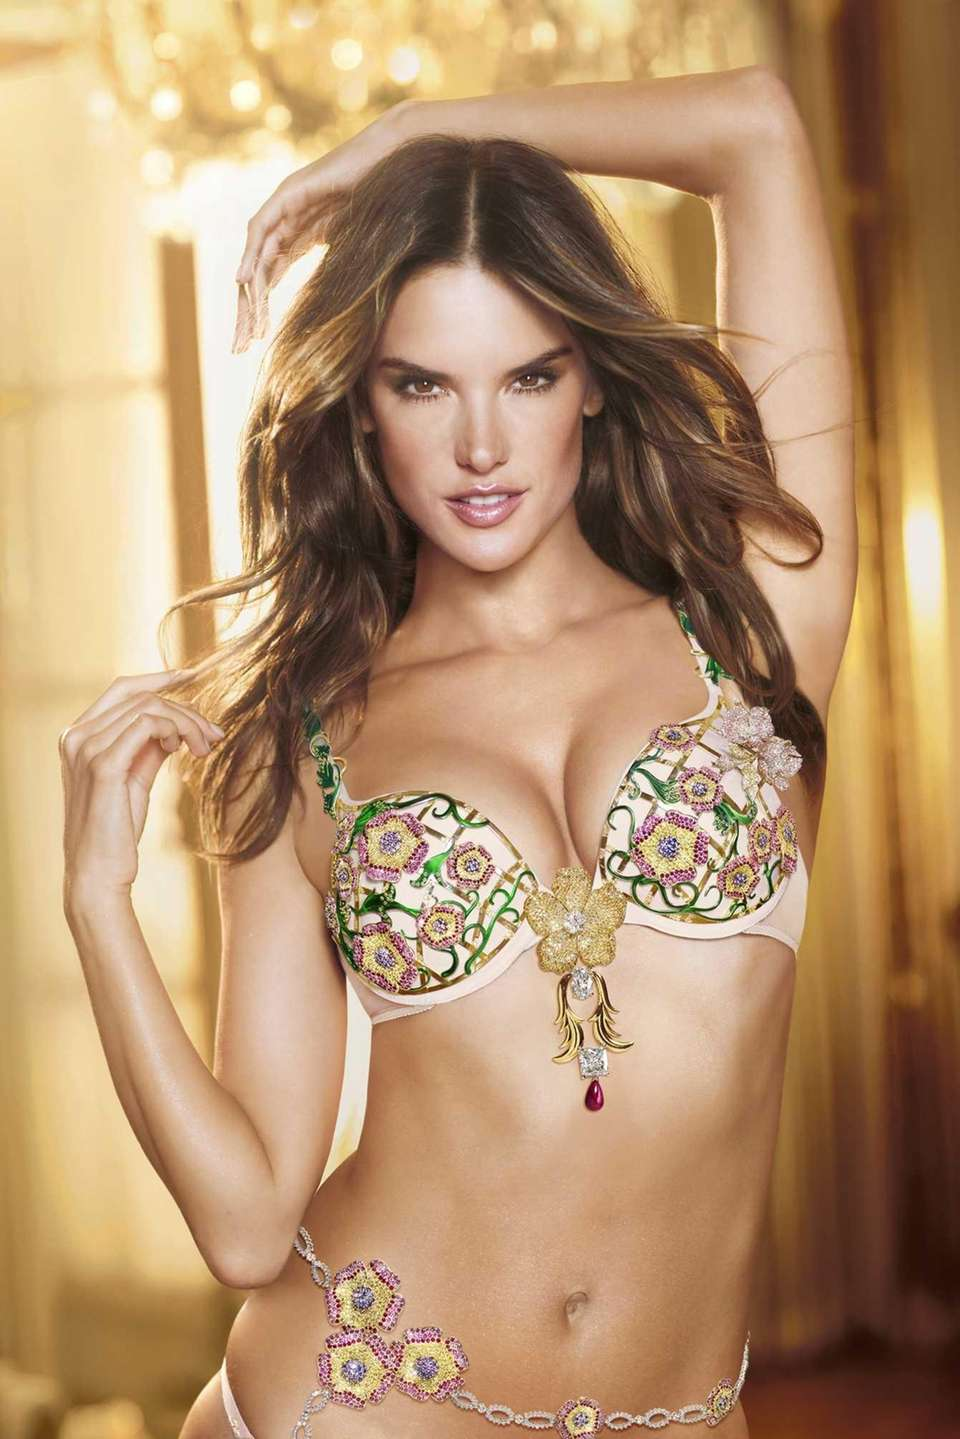 Victoria's Secret's 2012 fantasy bra was worth $2.5